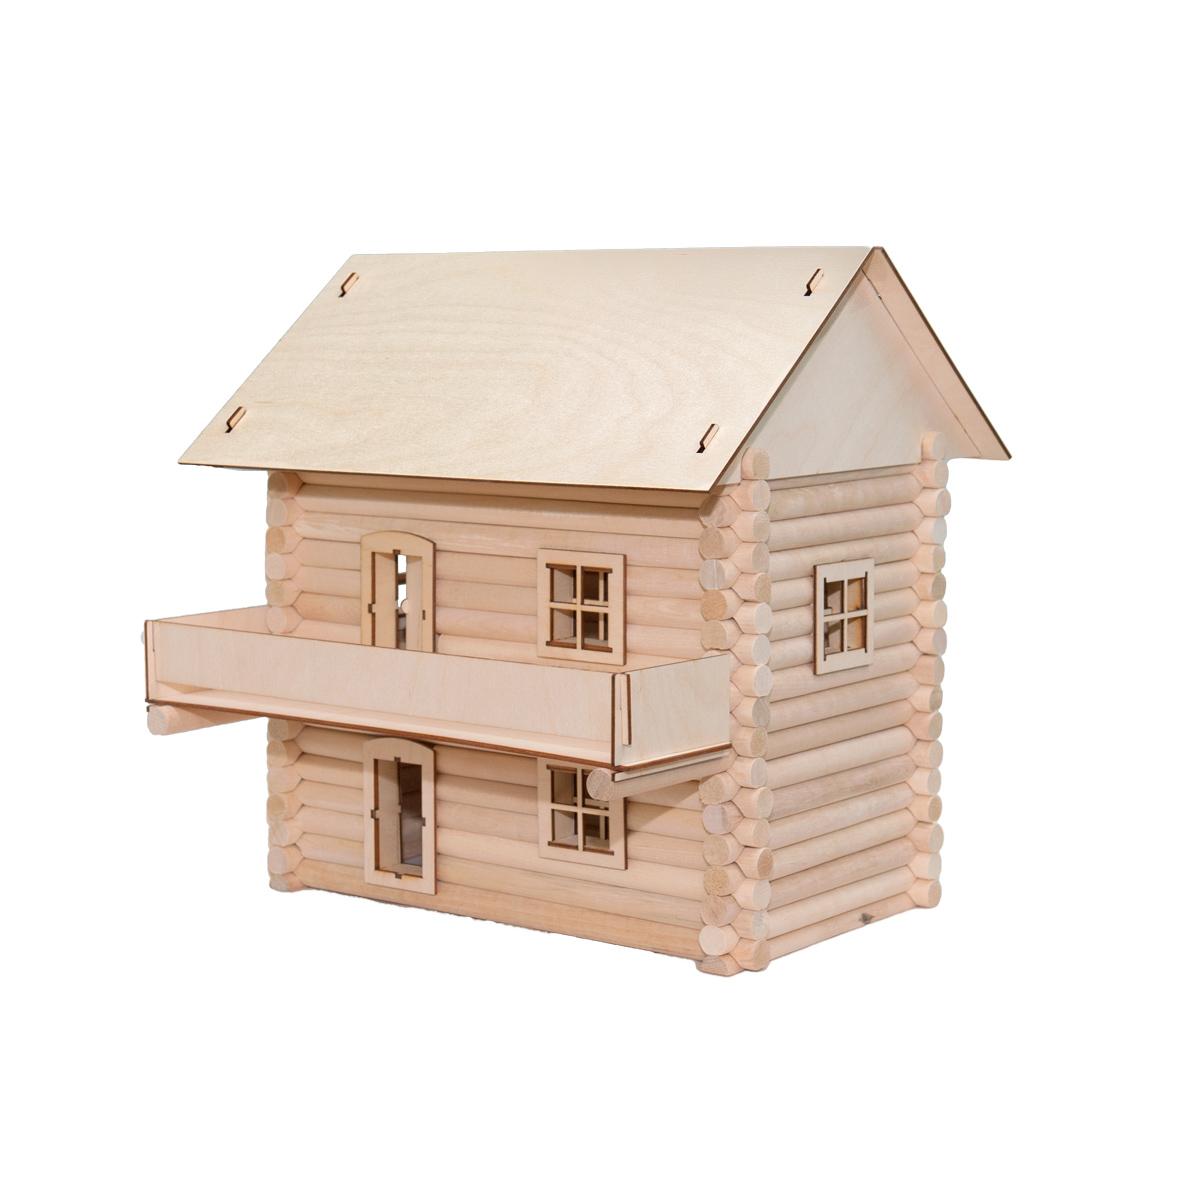 Конструктор деревянный – Светлица - Деревянный конструктор, артикул: 158421